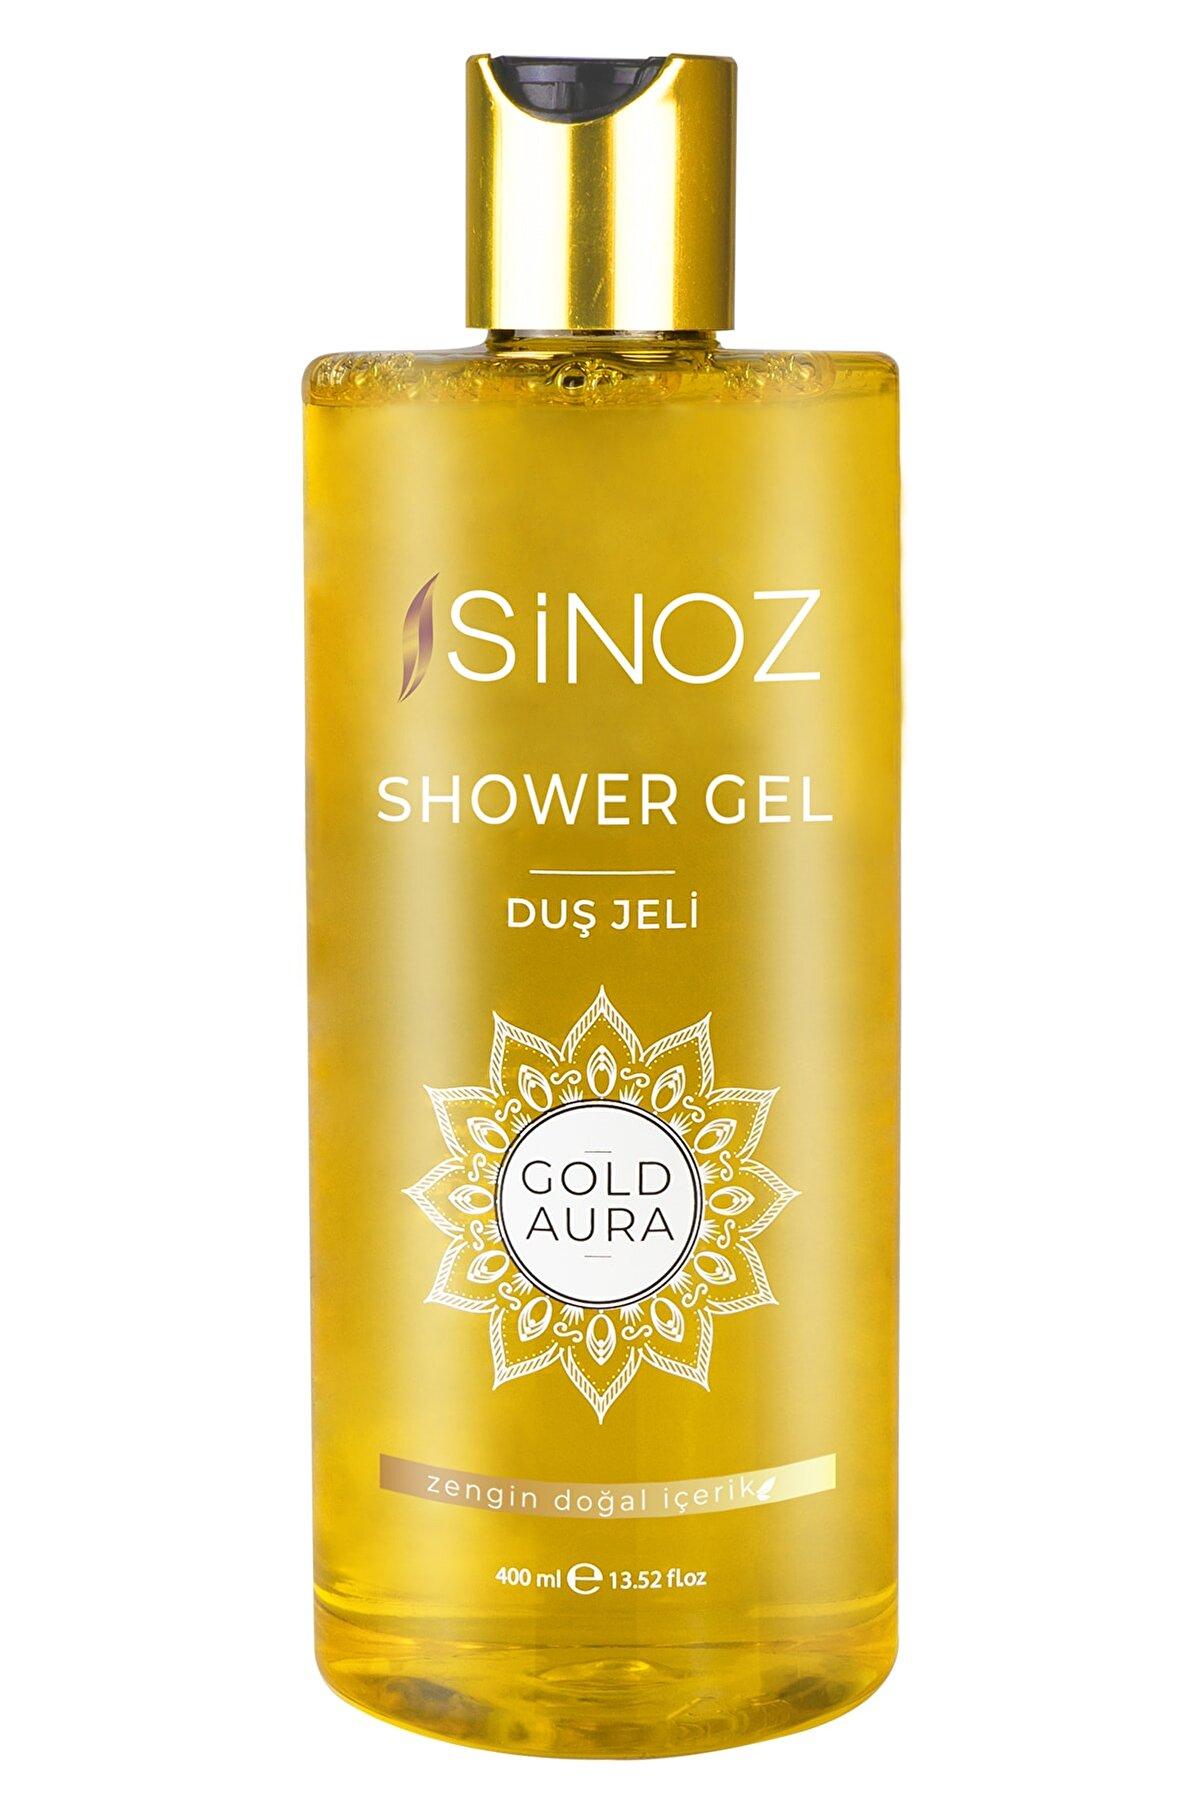 Sinoz Duş Jeli Gold Aura 400 ml